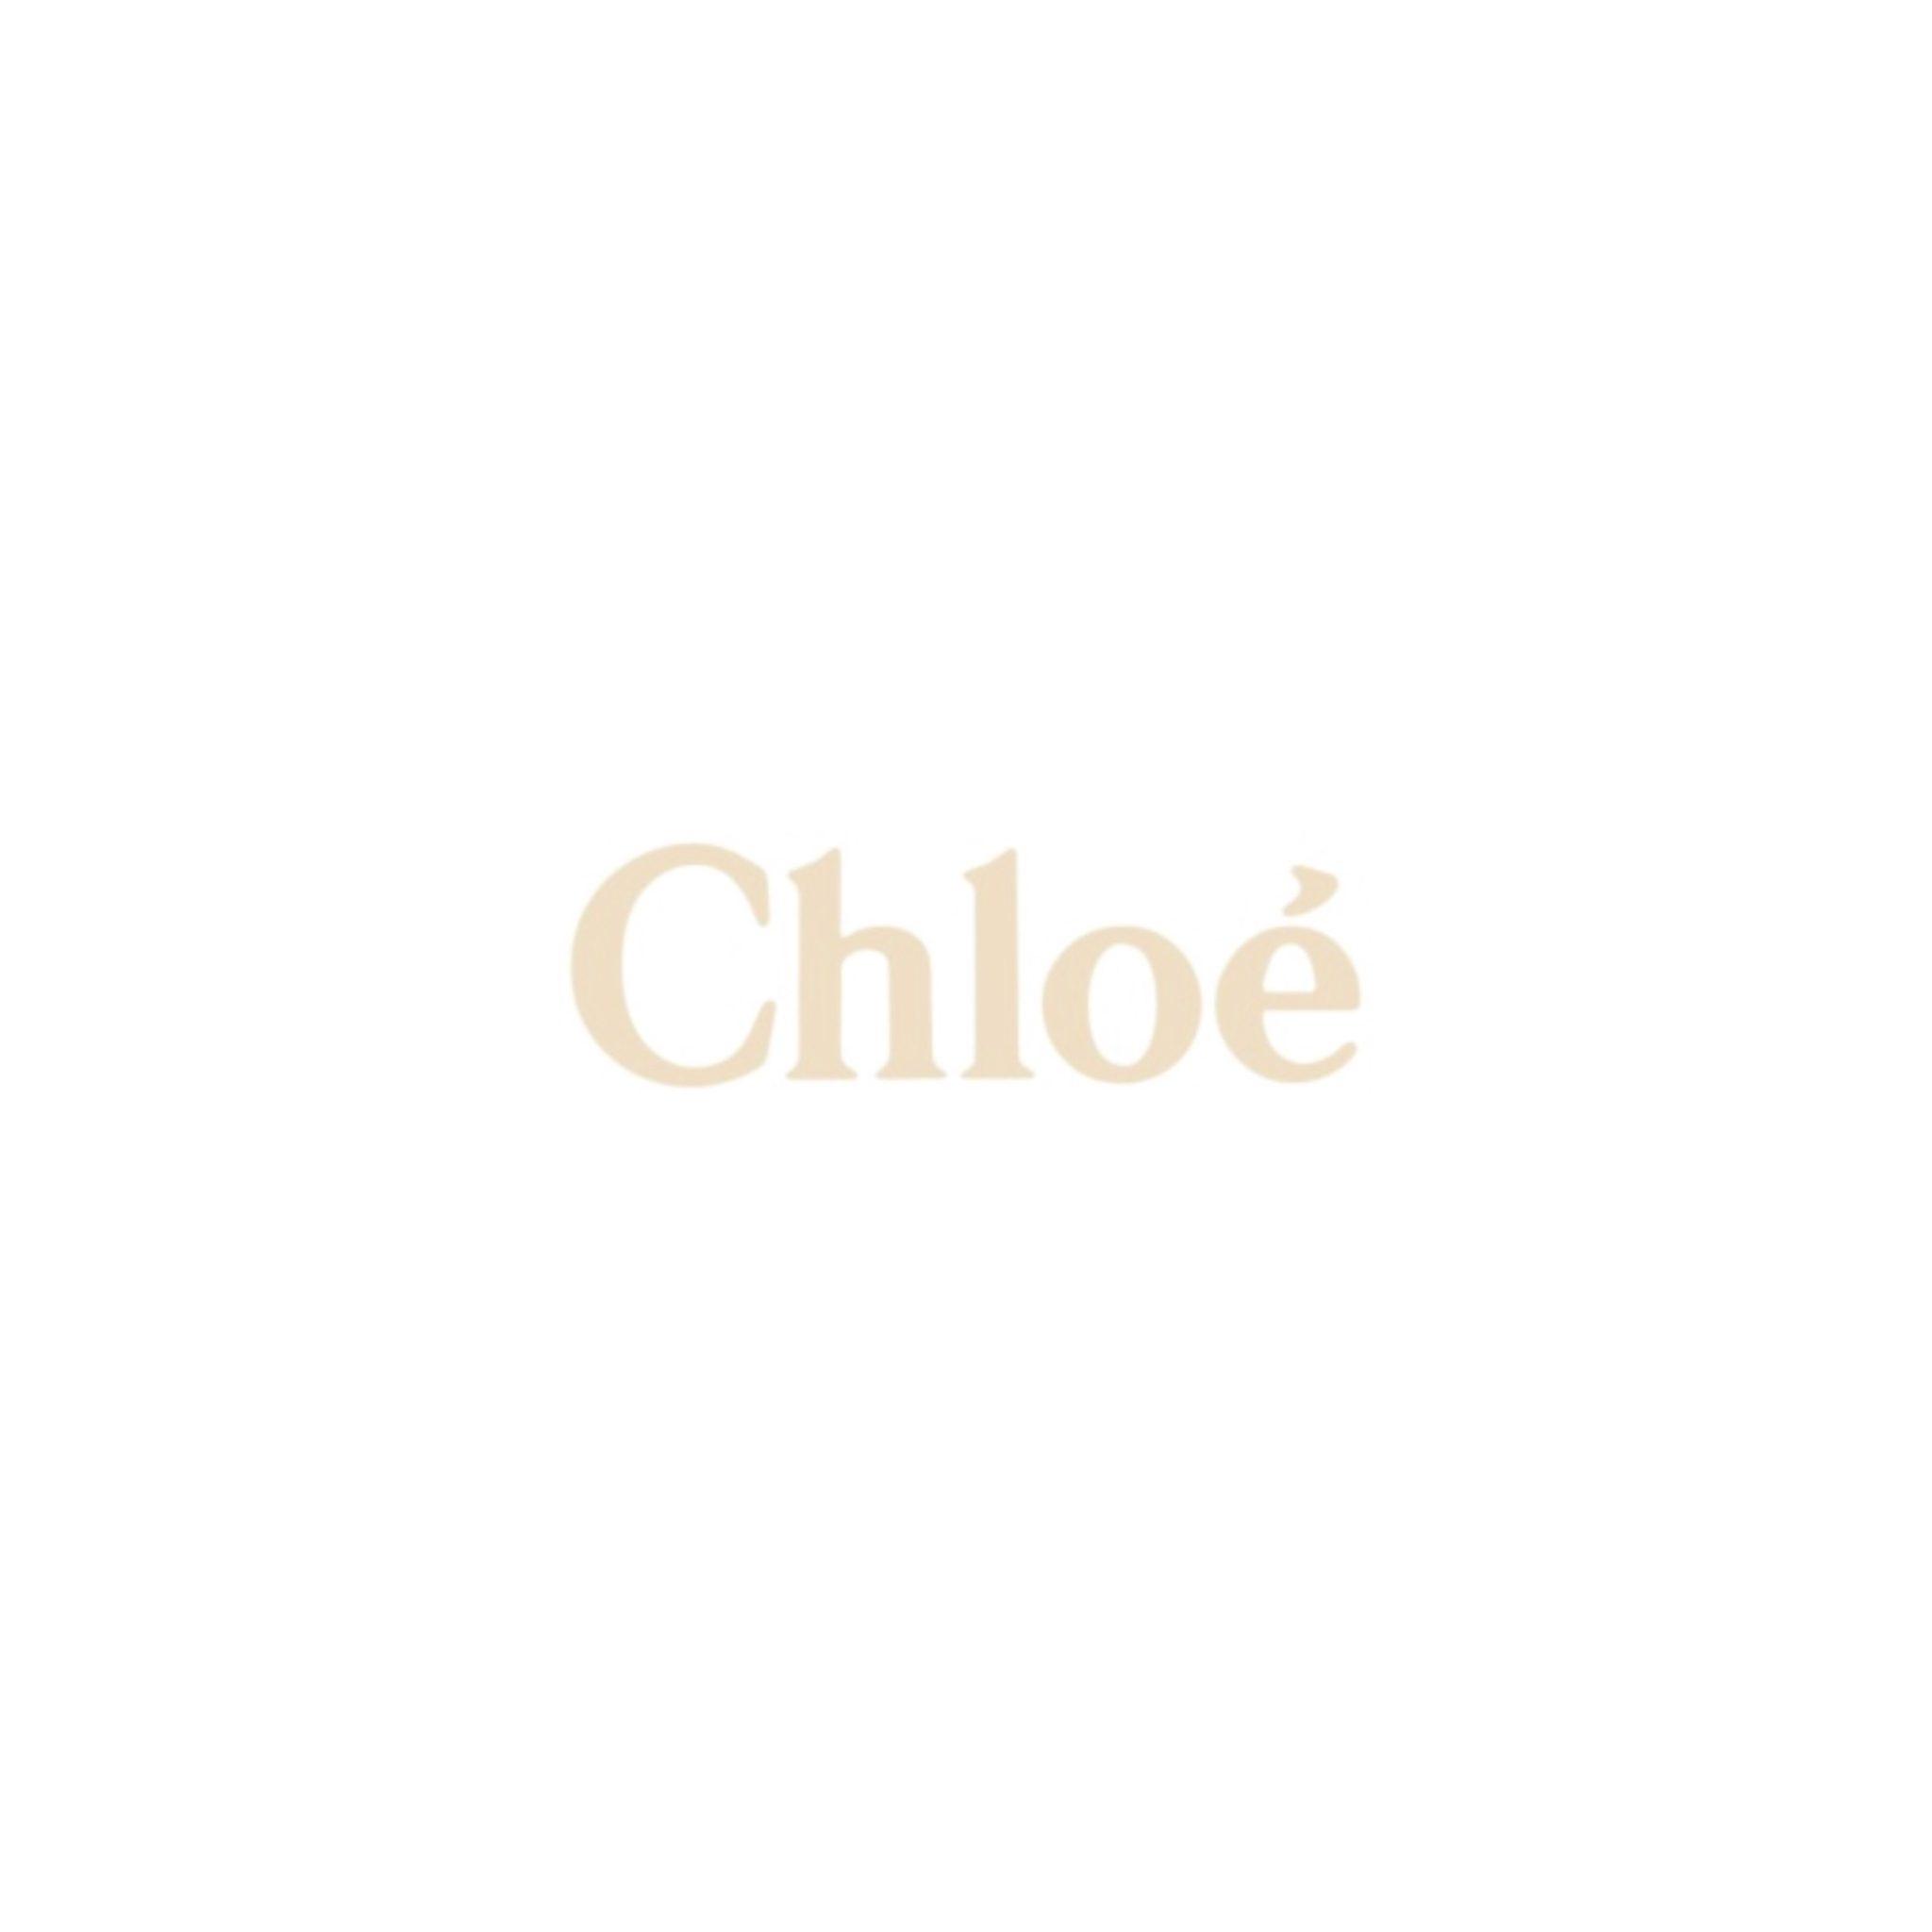 Chloé, Arthuretphilippine, Lolita Jacob, Arthur et Philippine, Adeline Mai